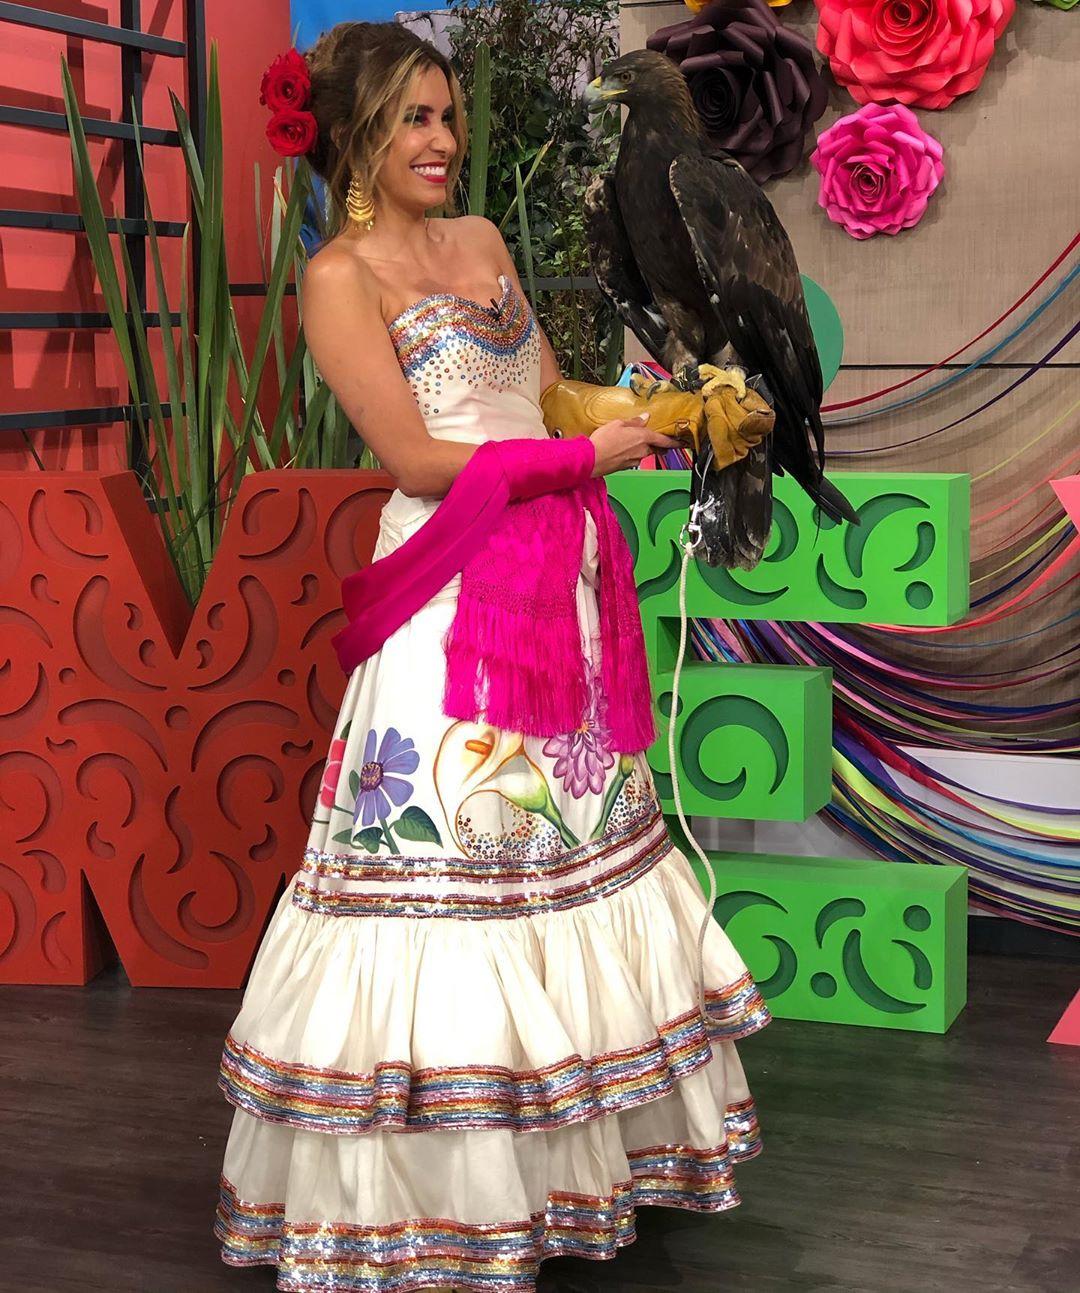 Andrea Escalona Hoy